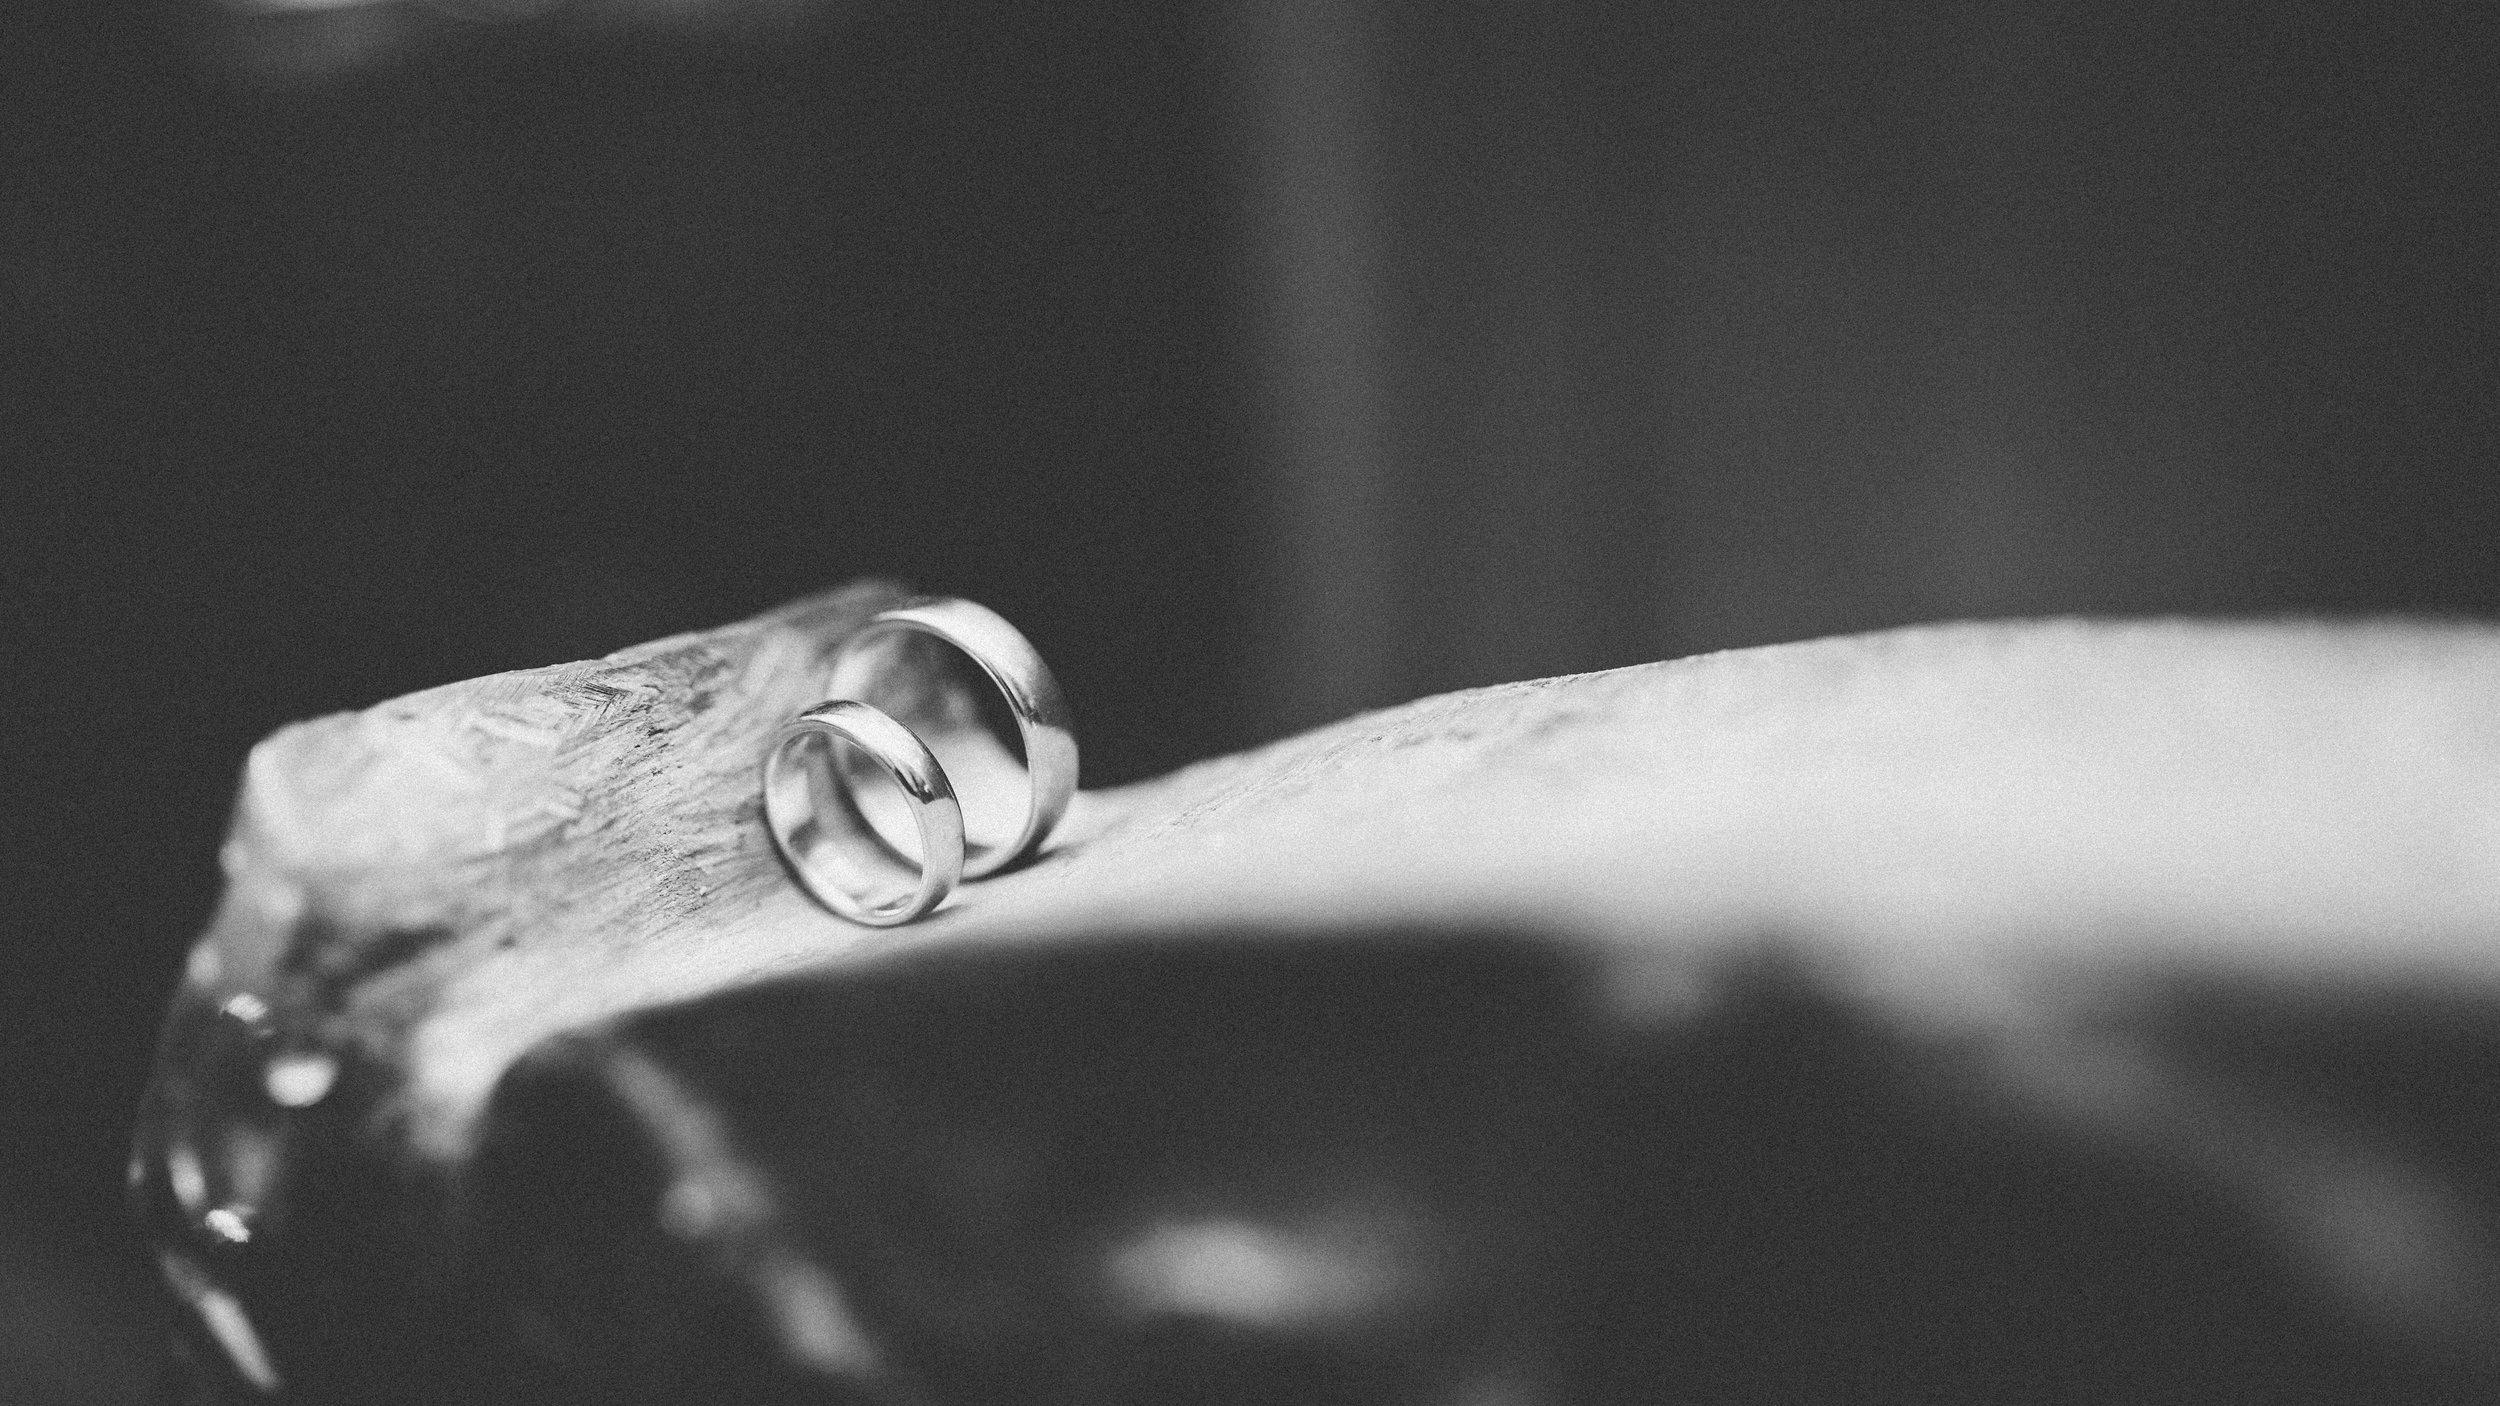 destination-wedding-photographer-slovakia-bratislava-bw-documentary-style-rings.jpg